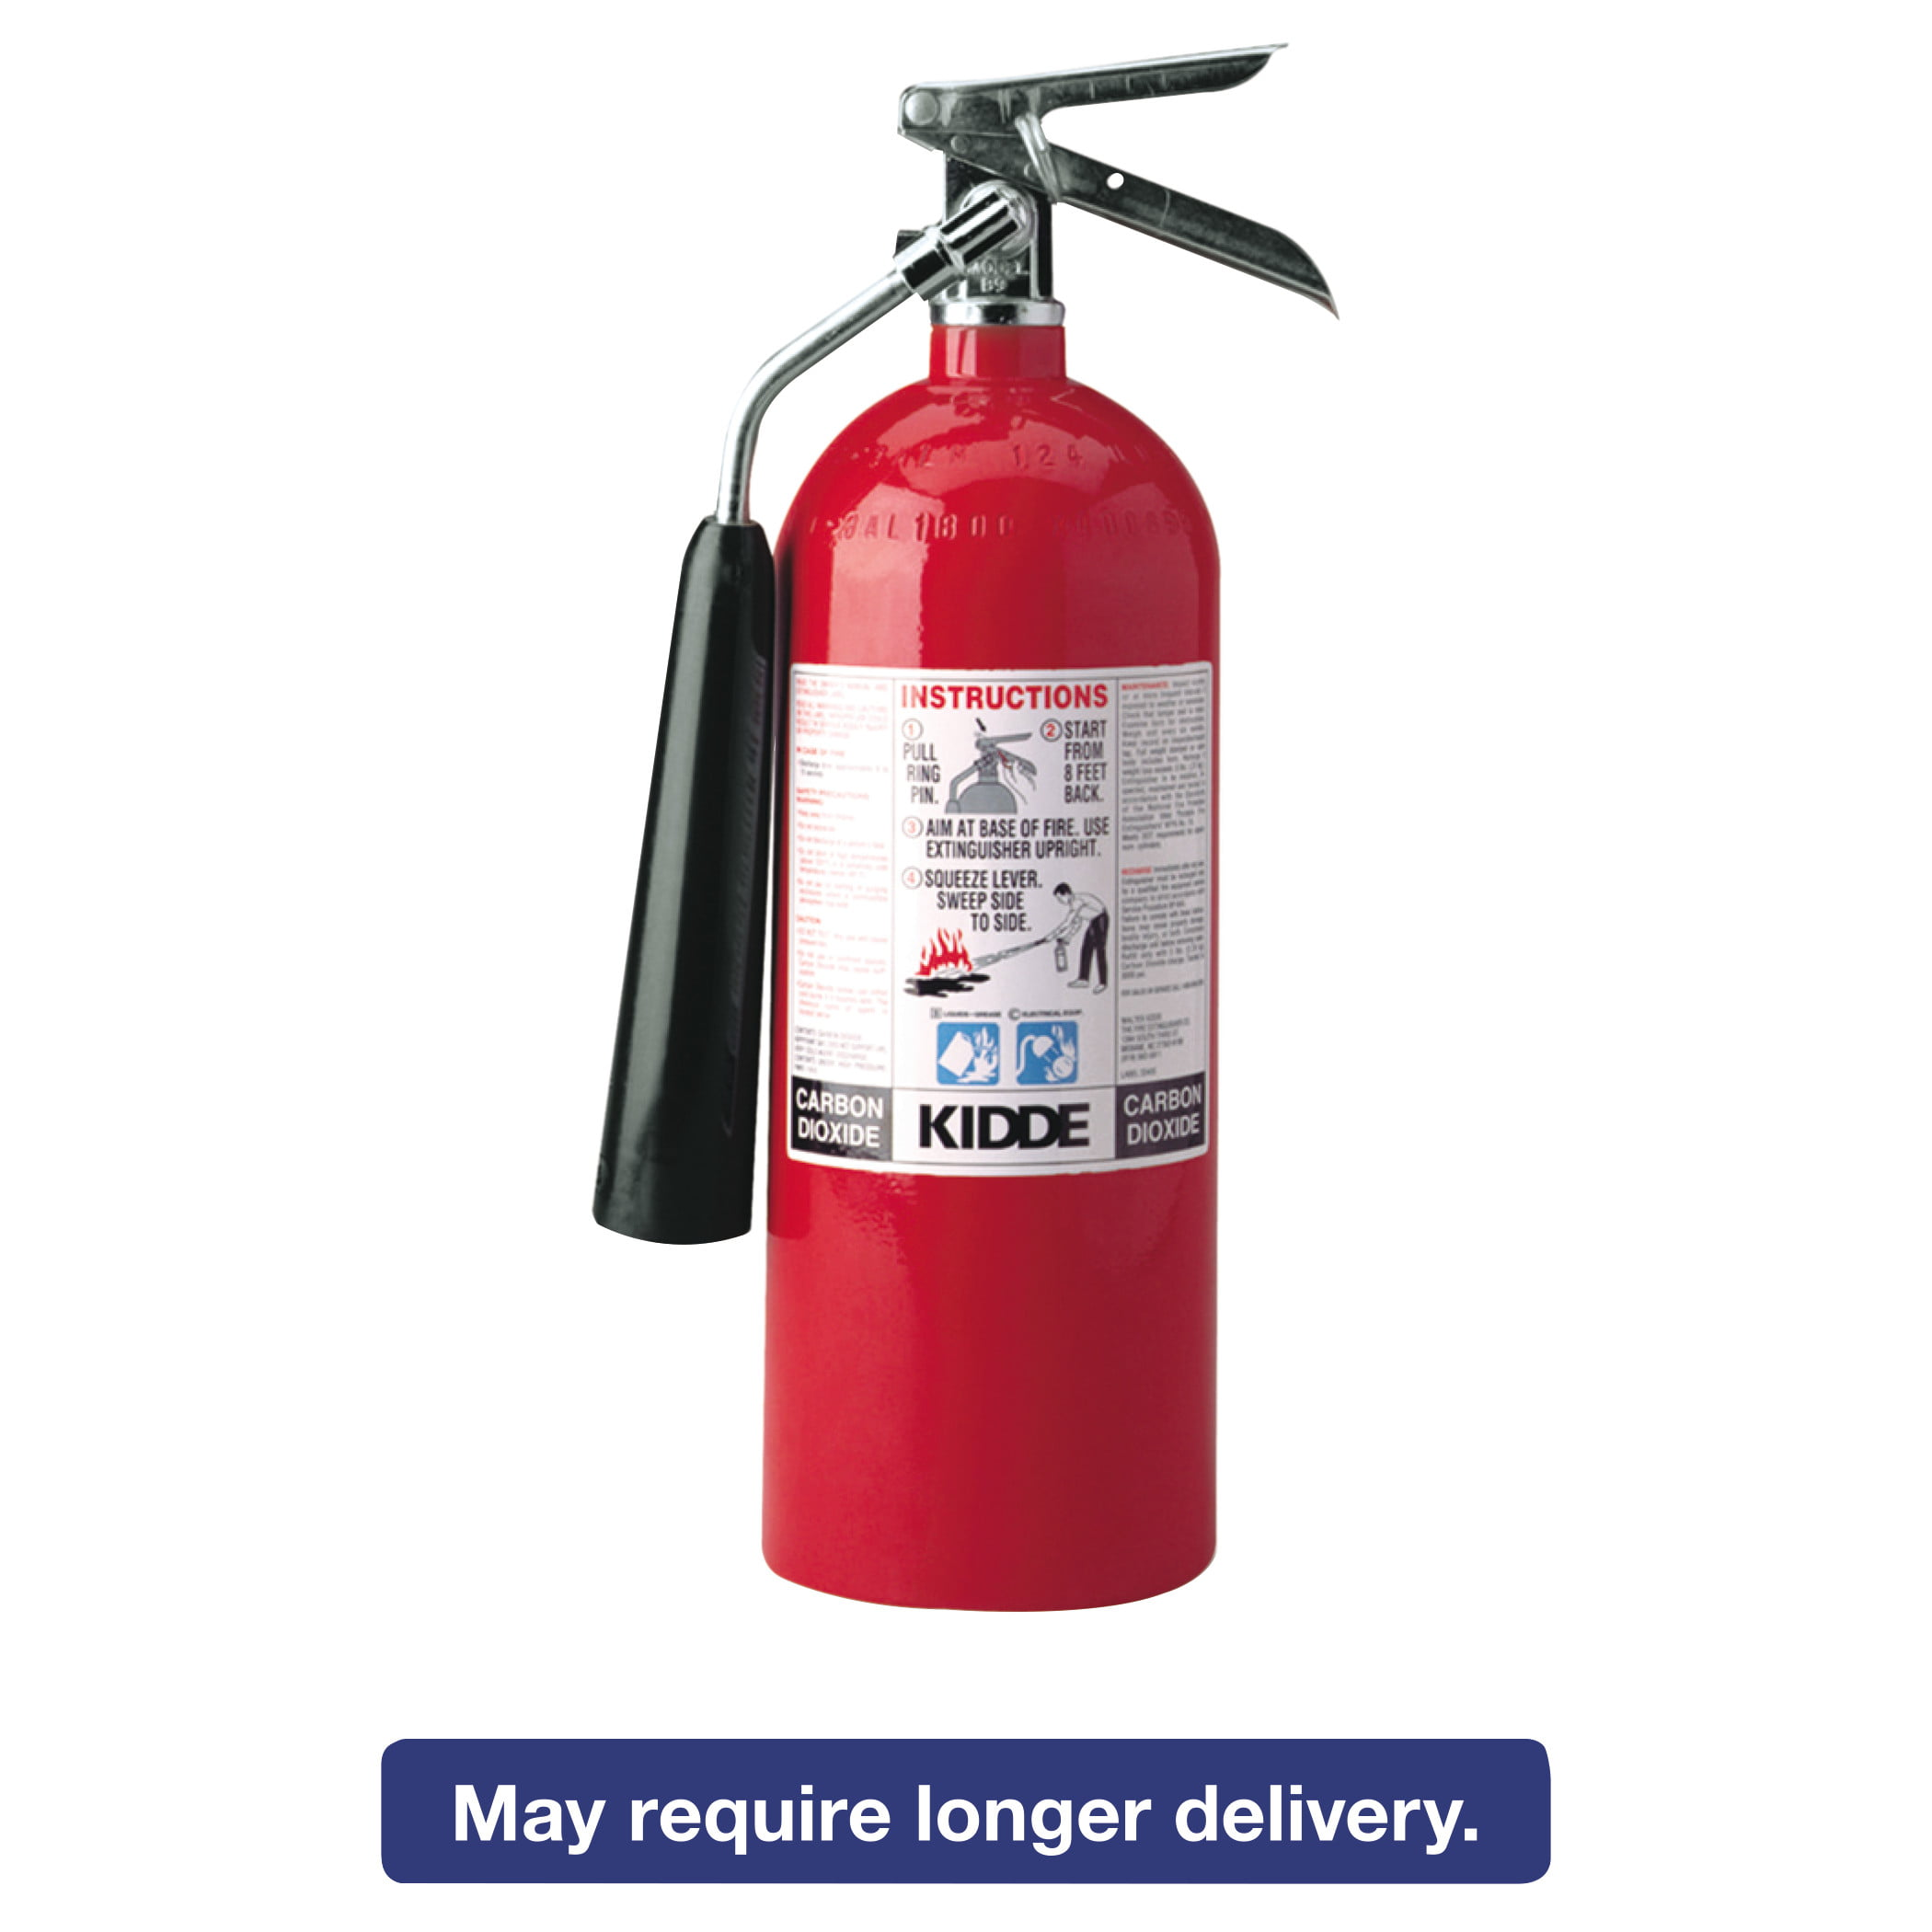 Kidde ProLine 5 CO2 Fire Extinguisher, 5lb, 5-B:C by KIDDE